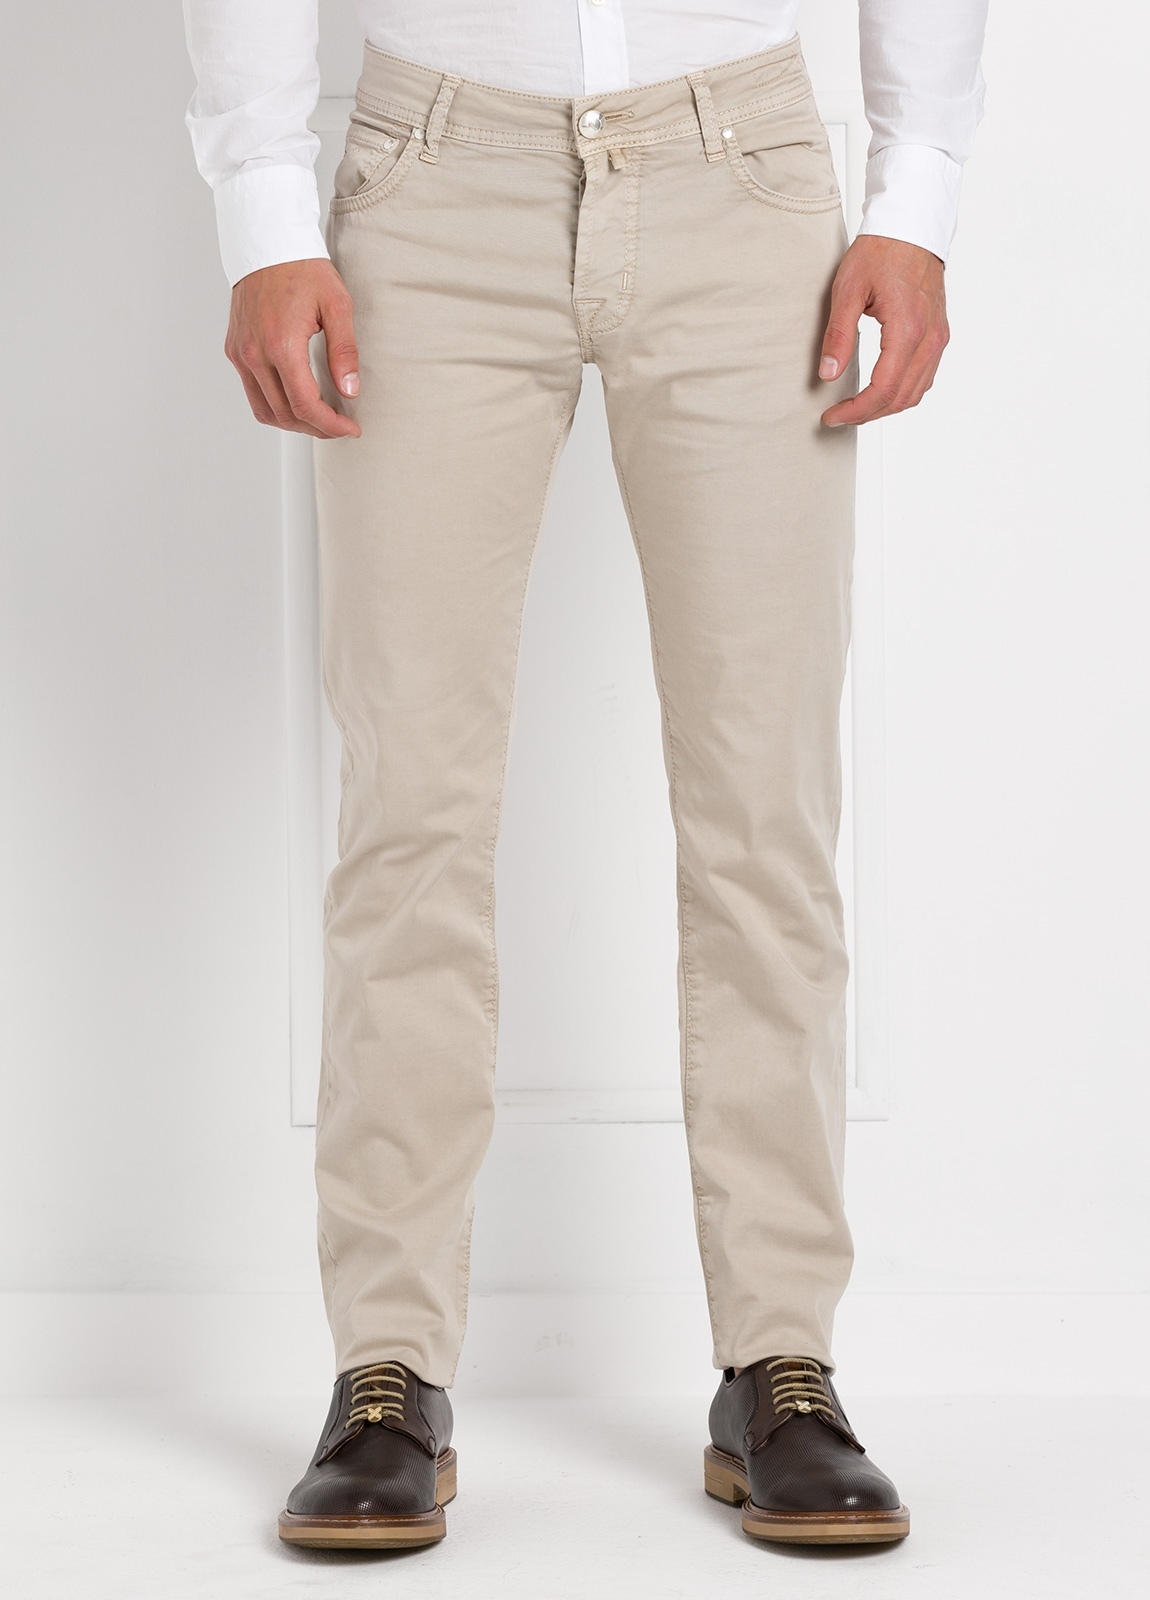 Pantalón cinco bolsillos modelo PW622 color beige. Algodón gabardina vintage. Algodón satén vintage.